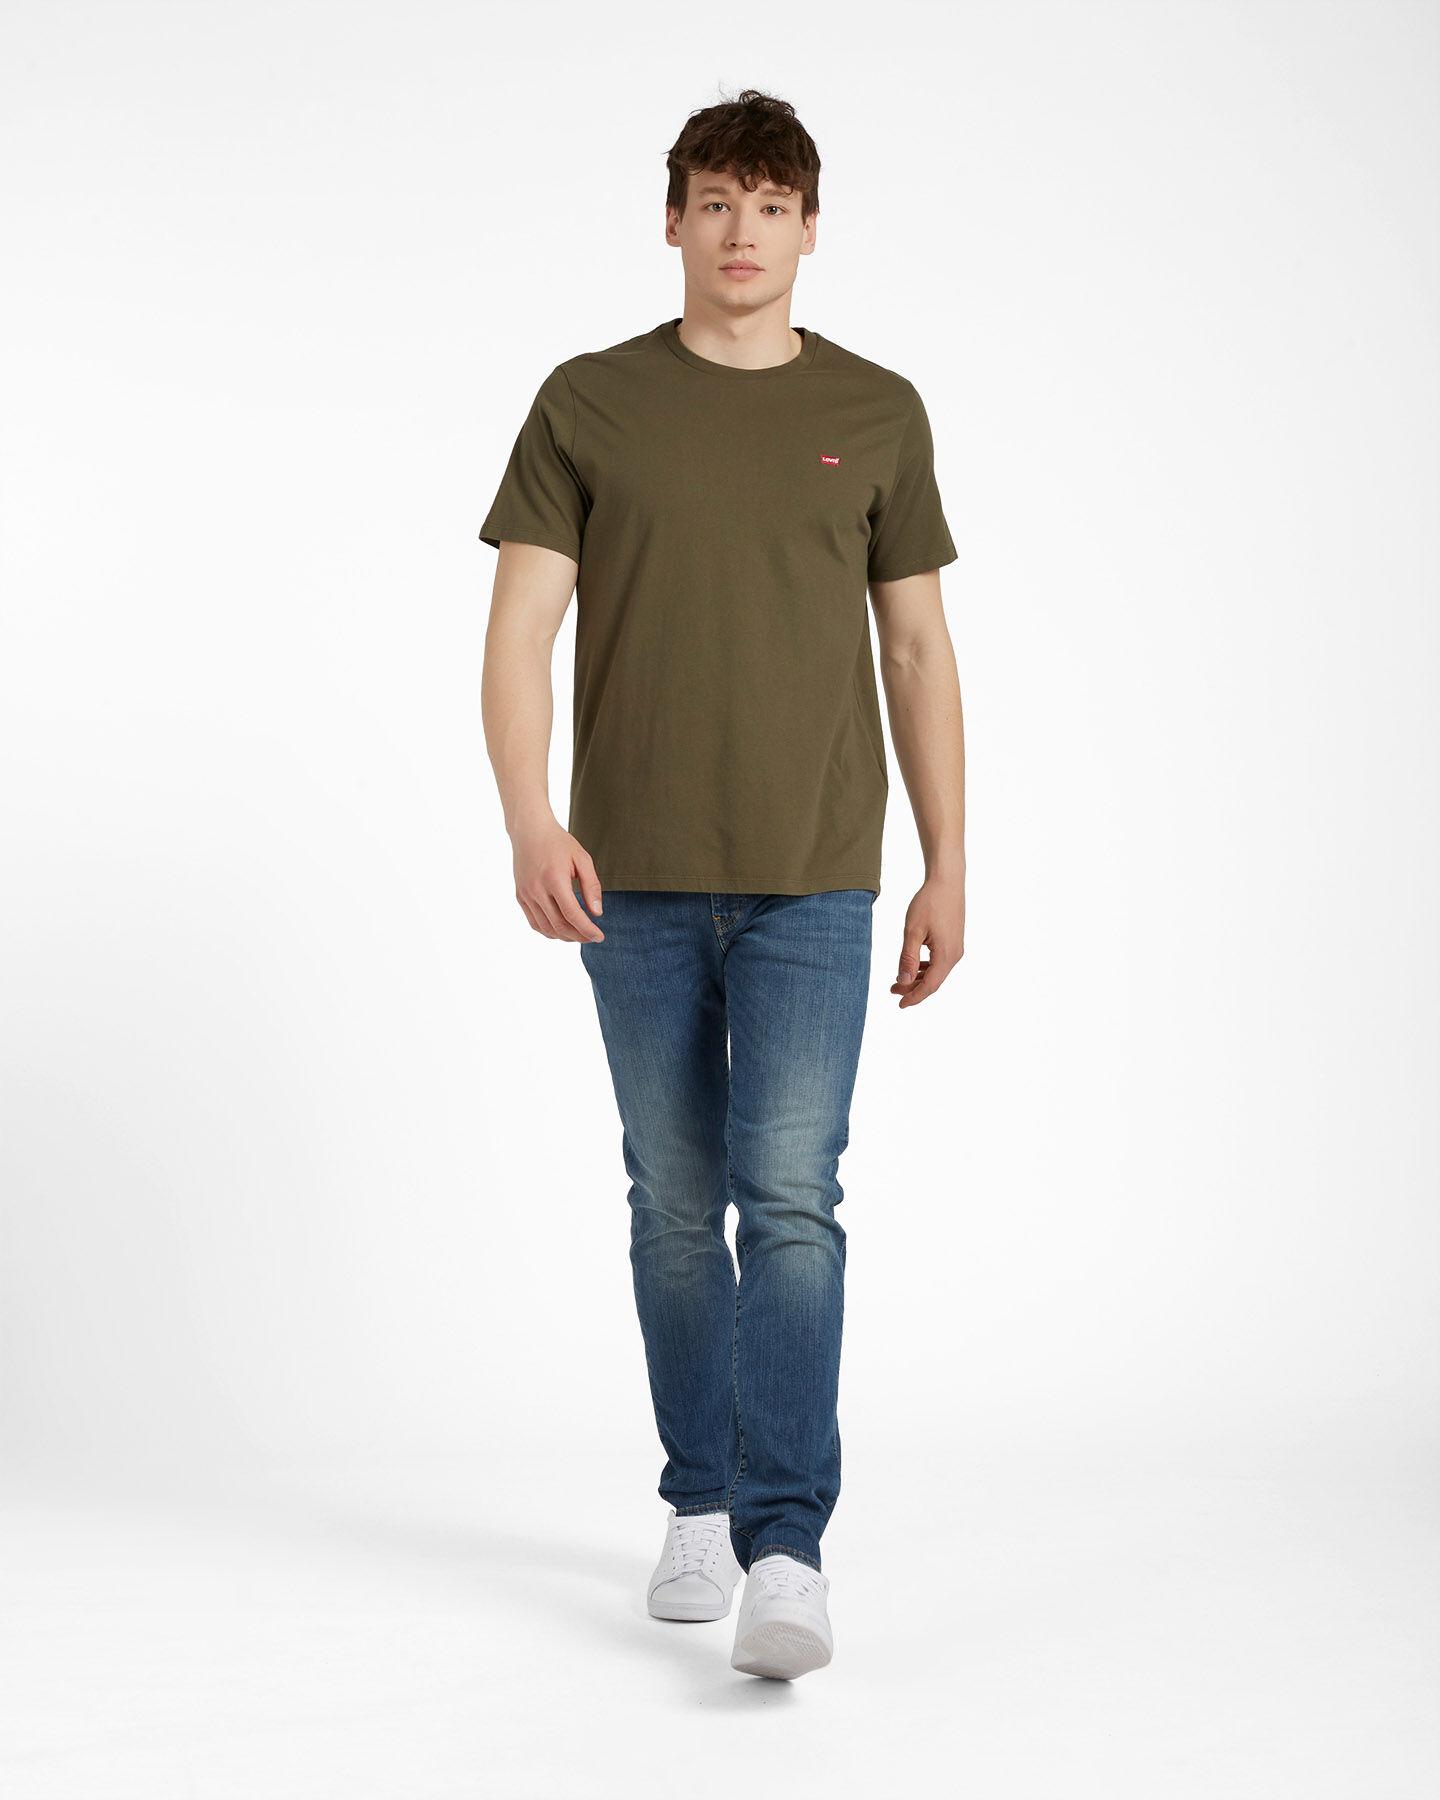 T-Shirt LEVI'S ORIGINAL M S4076919 scatto 3